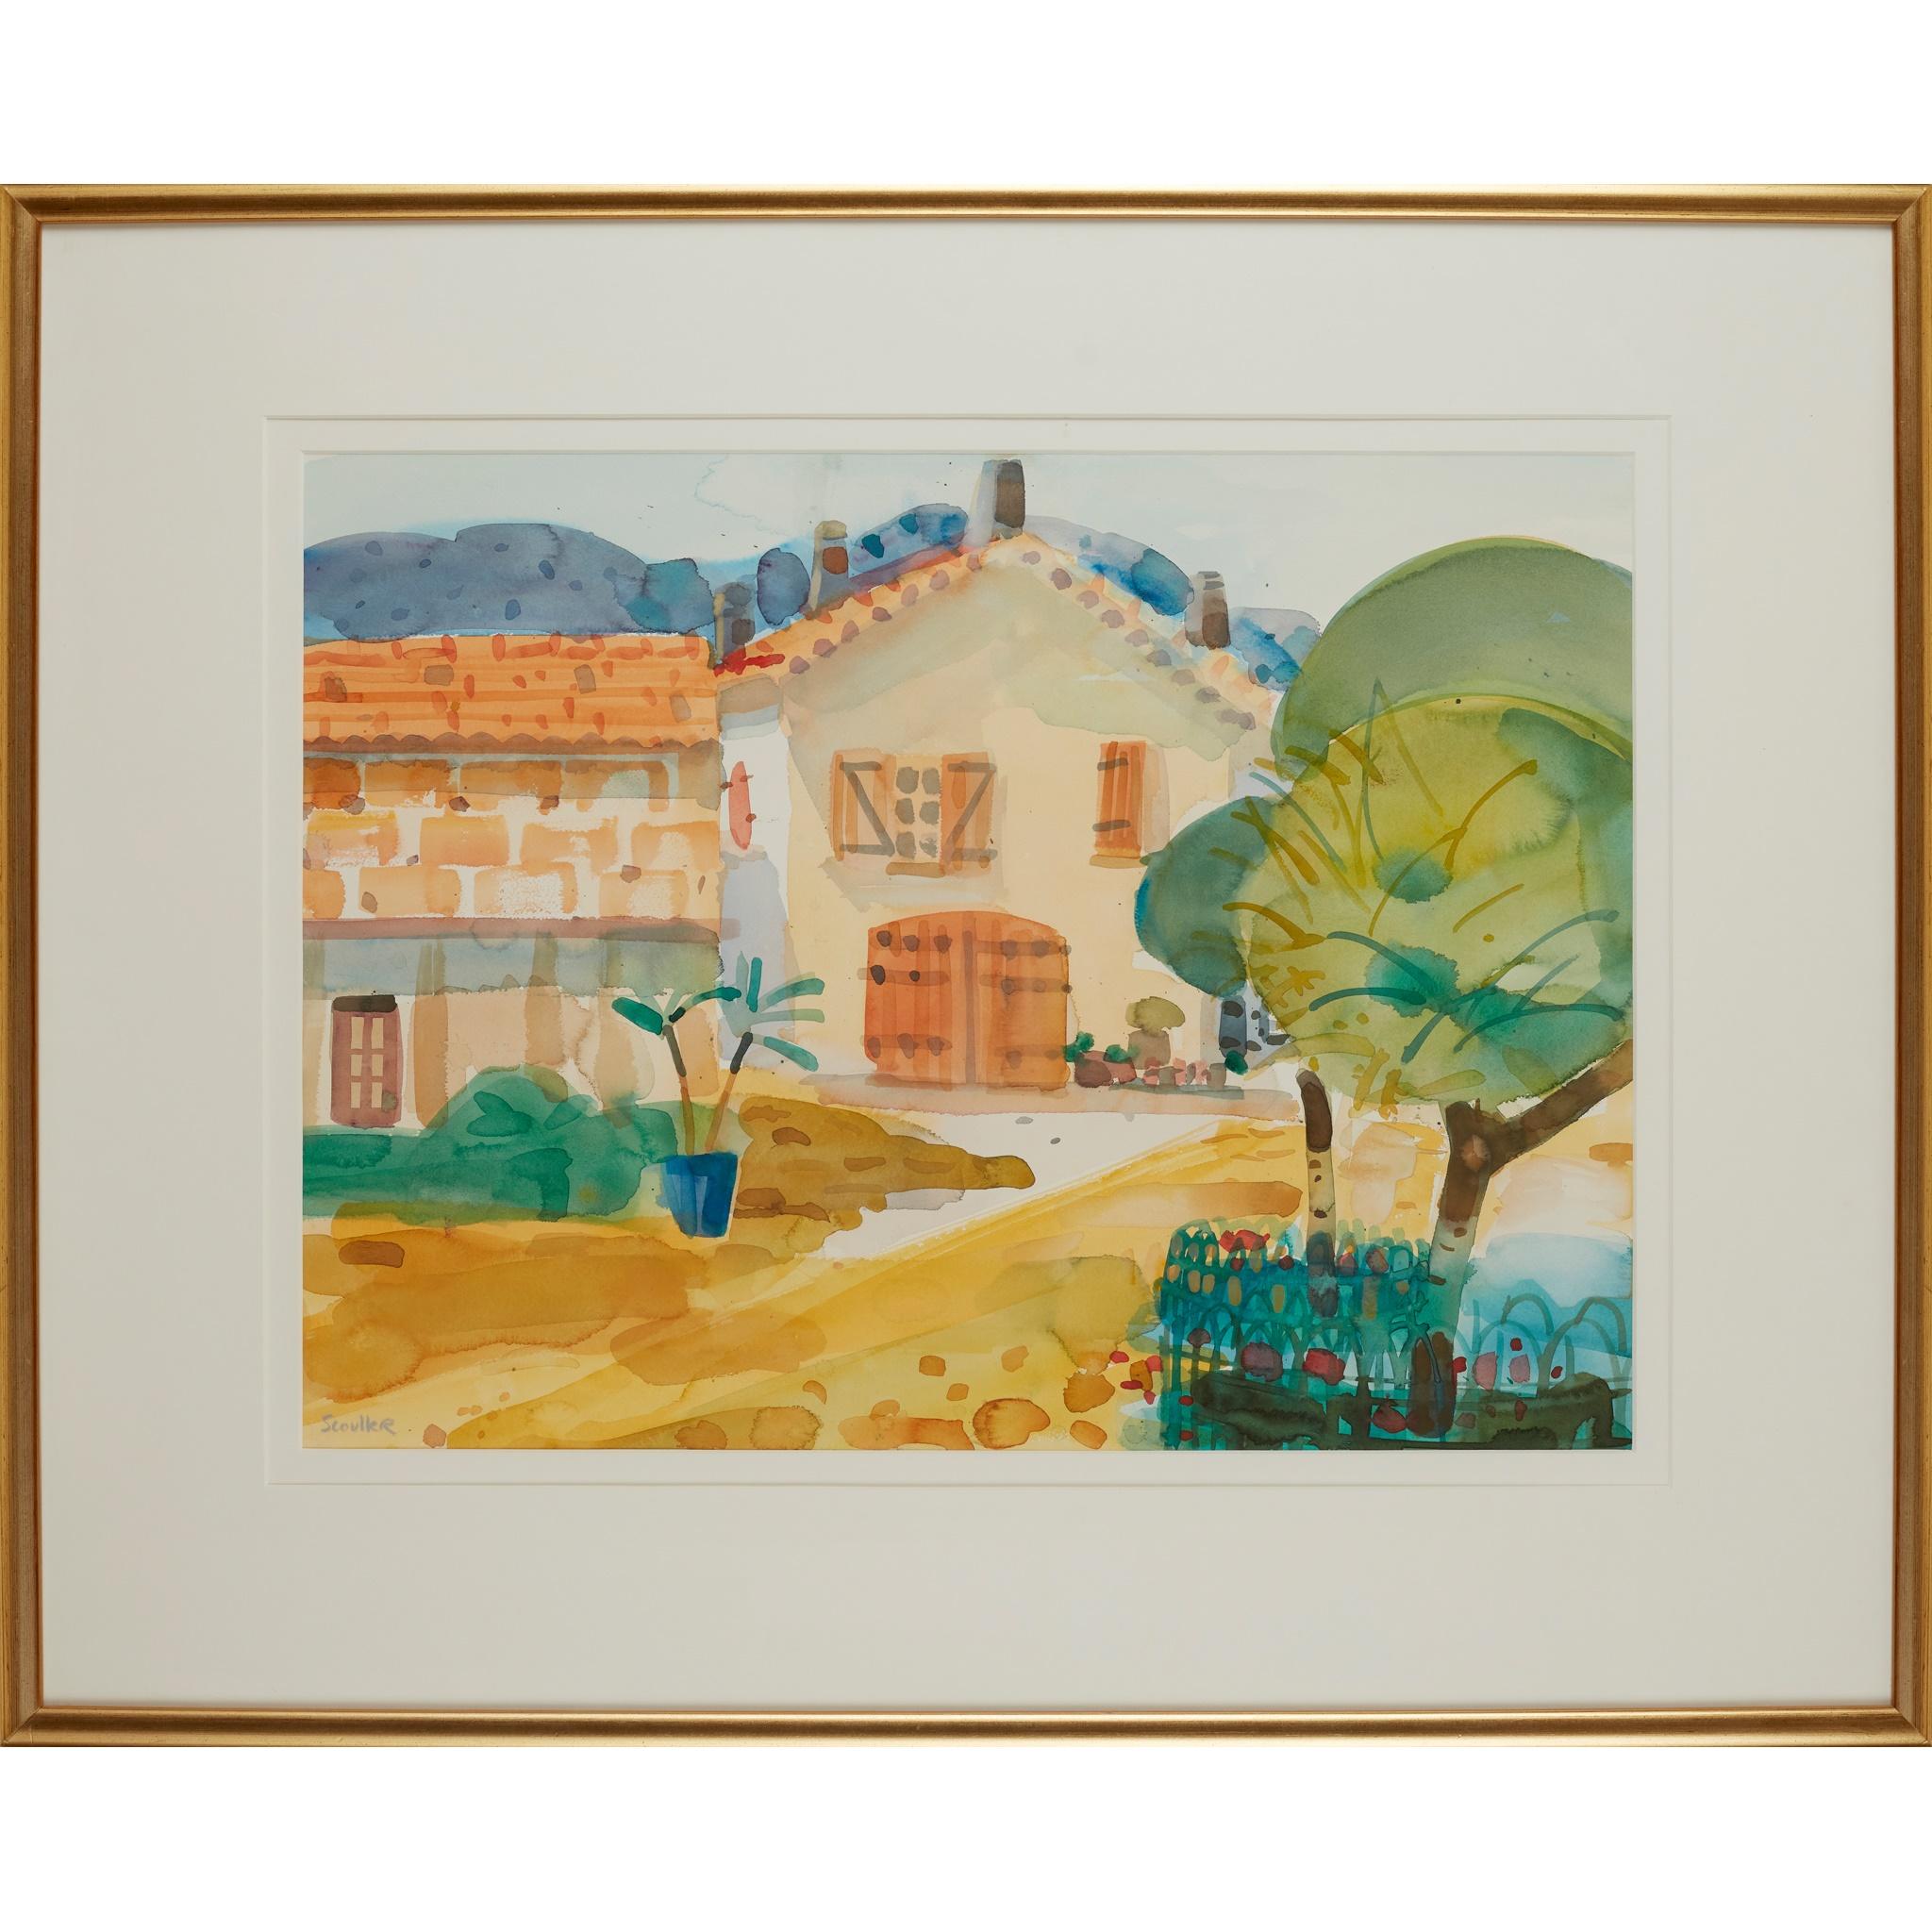 § GLEN SCOULLER R.S.W., R.G.I. (SCOTTISH 1950-) THE FARM HOUSE, SEILLANDS - Image 2 of 3